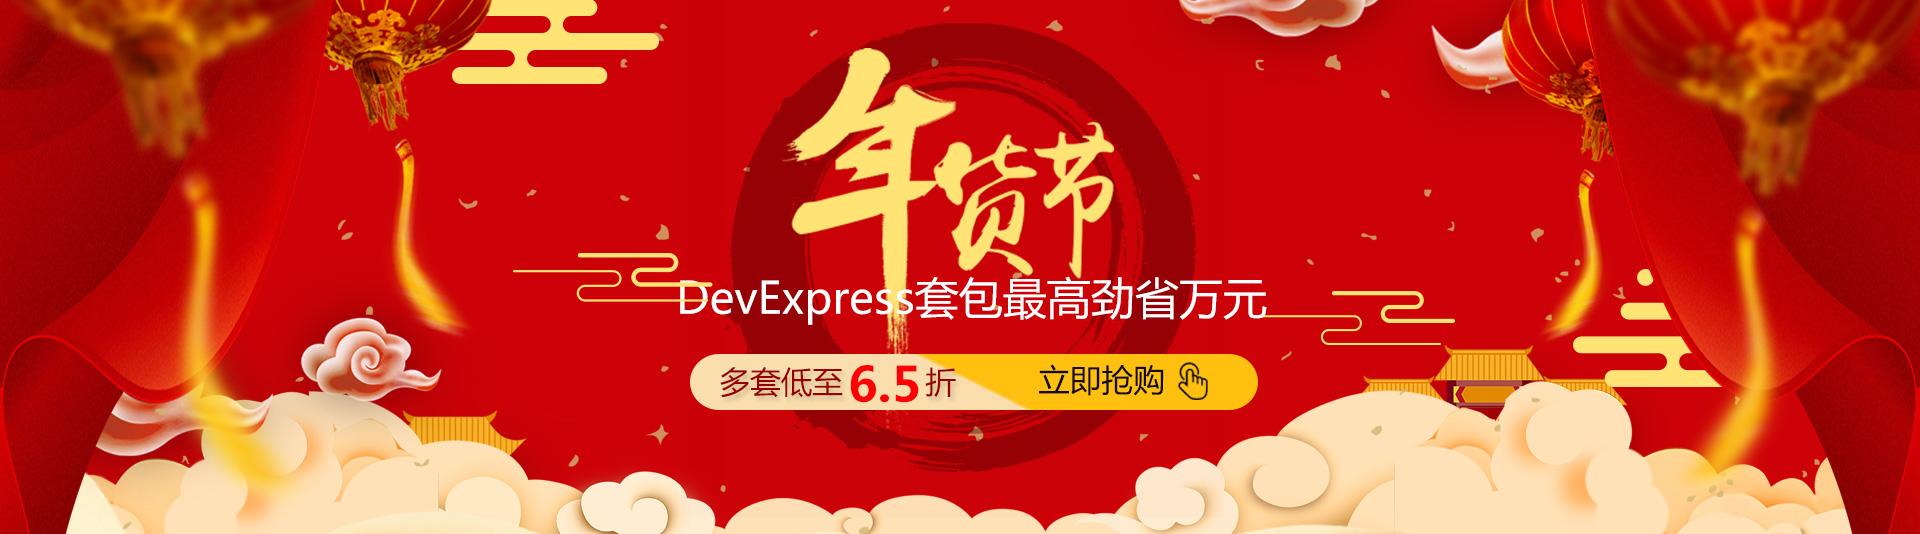 DevExpress年货节 火爆开抢